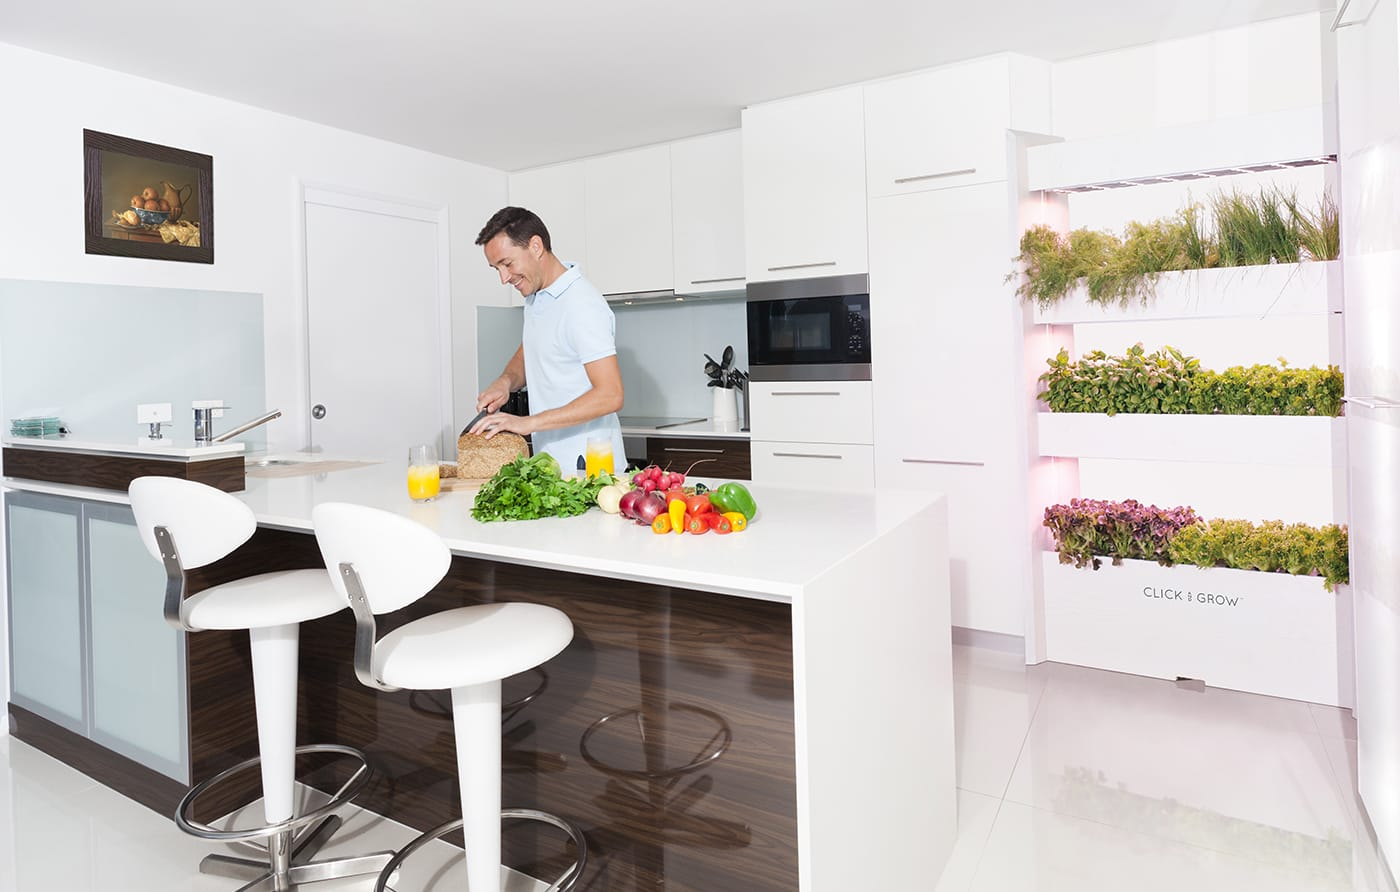 Raise veggies like an astronaut with these Wall Farms